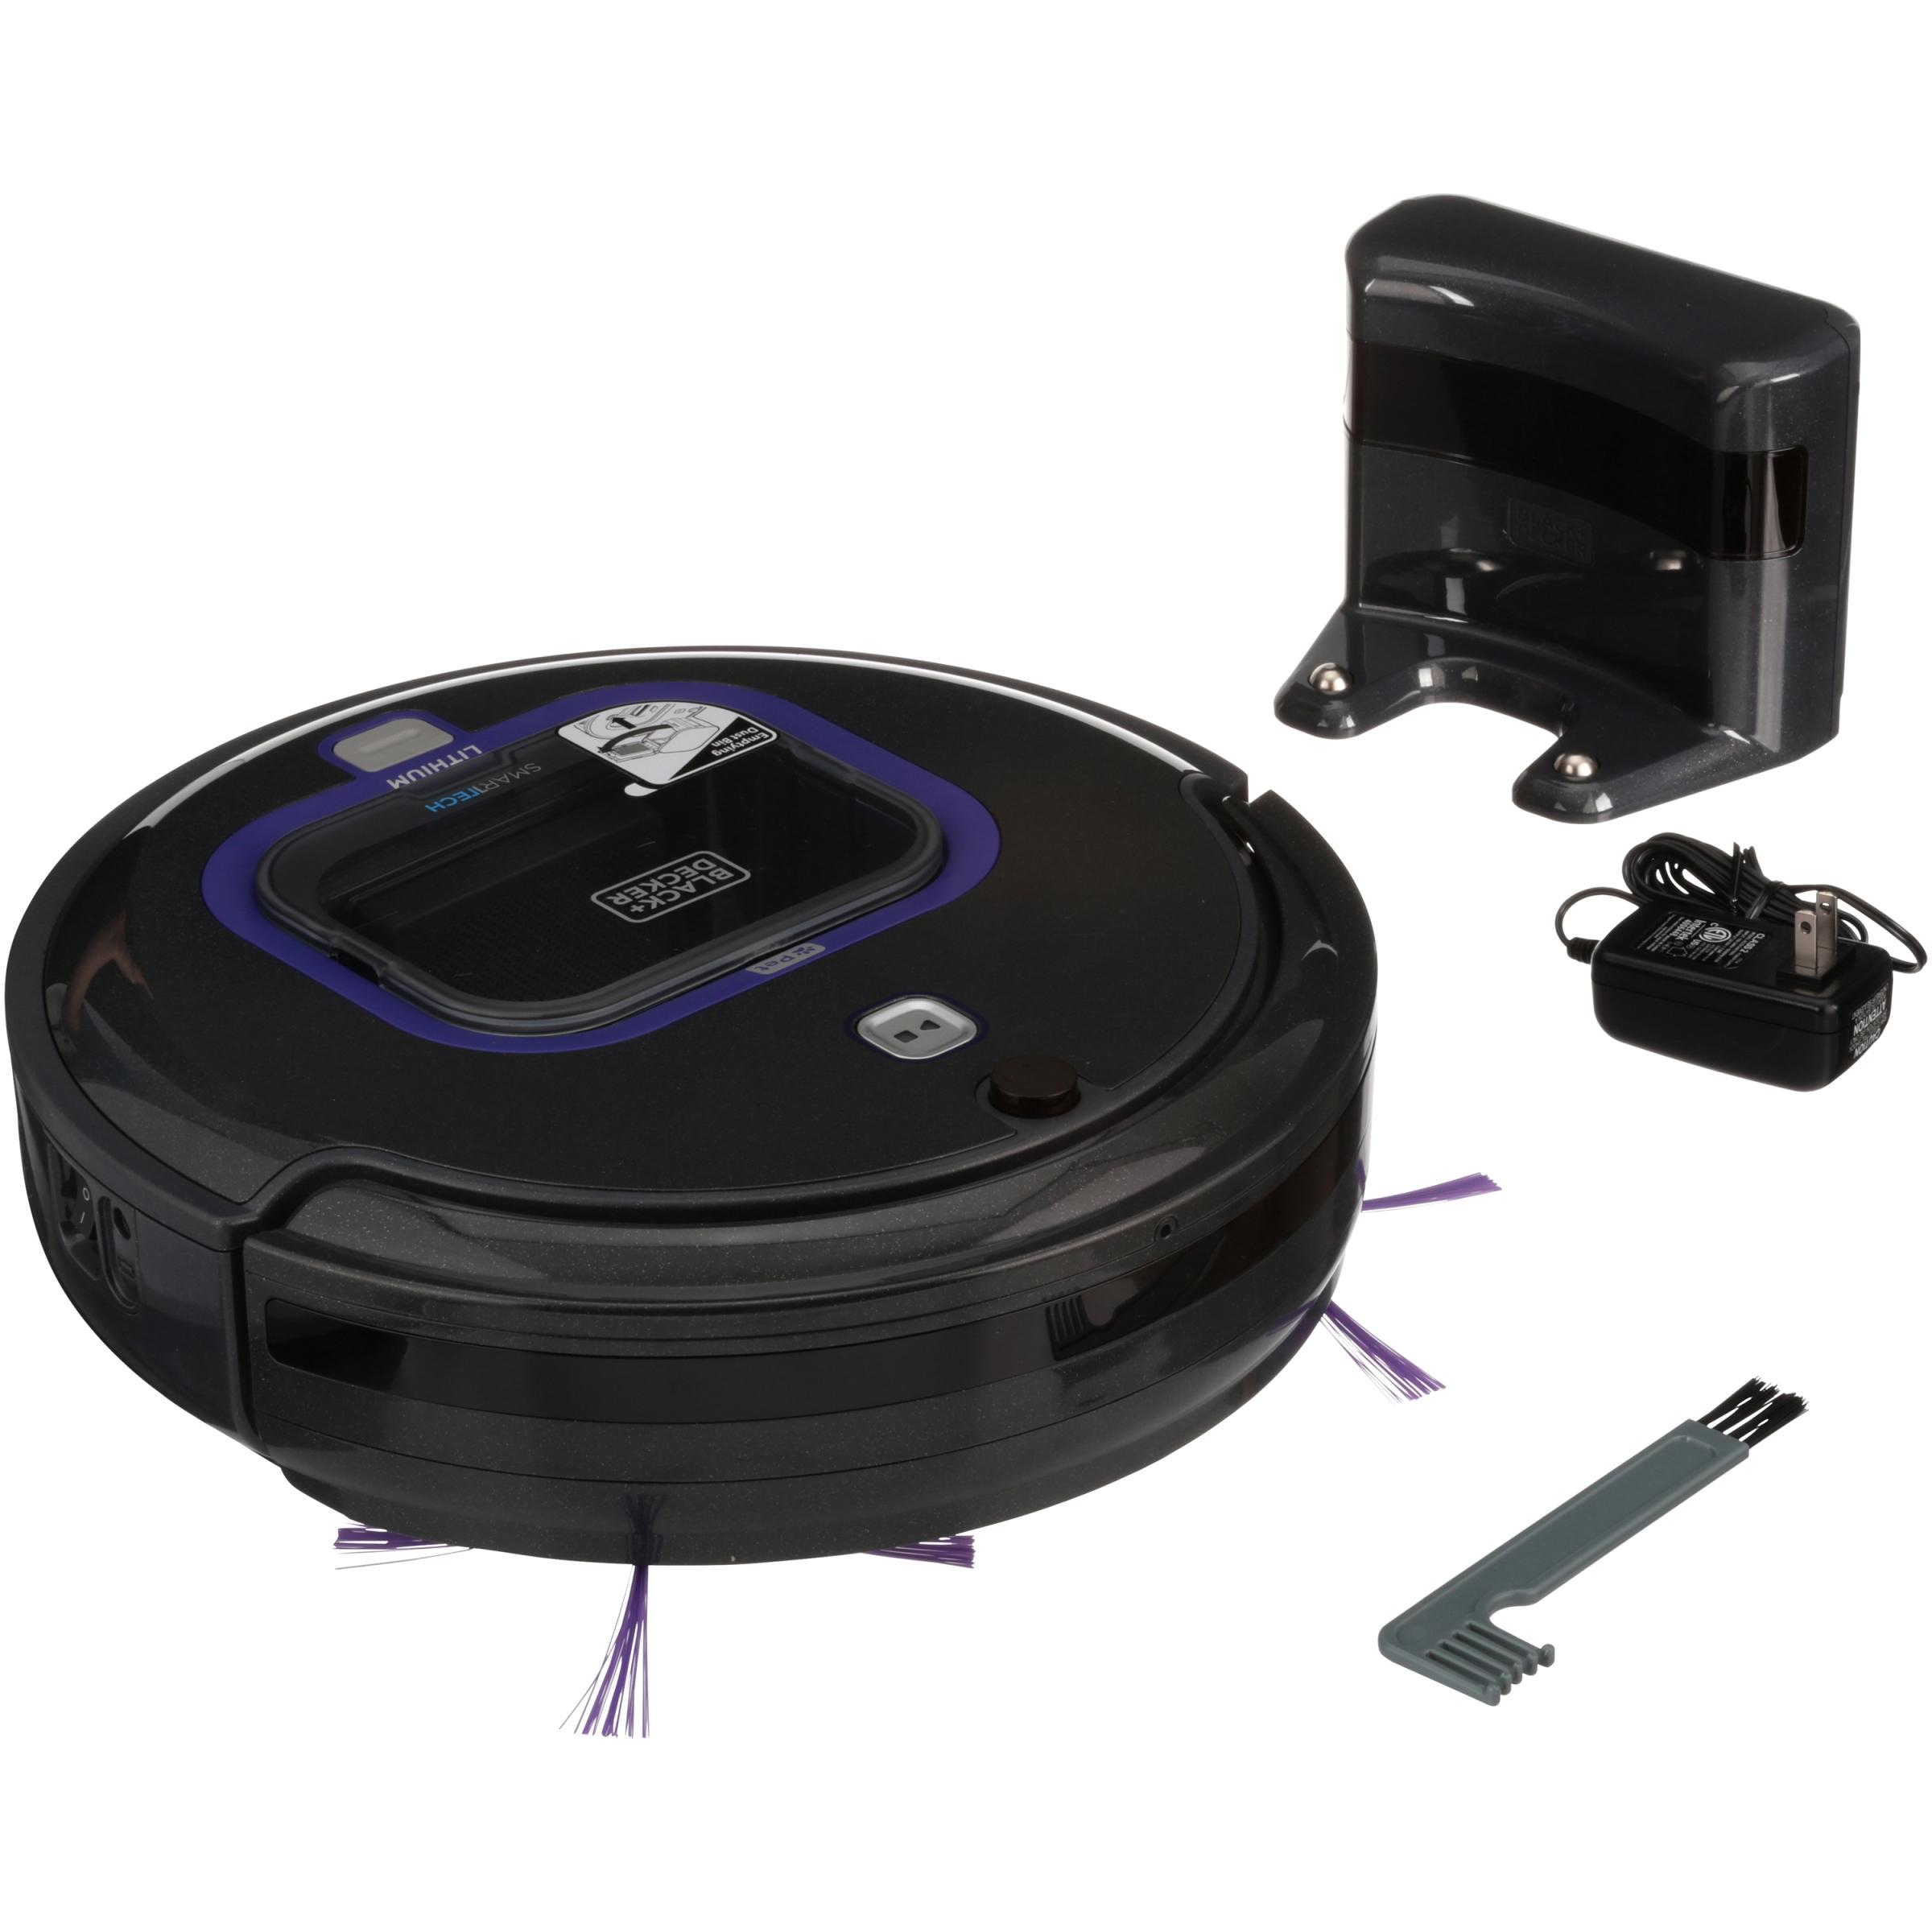 BLACK+DECKER PET Lithium Robotic Vacuum with SMARTECH, HRV420BP07